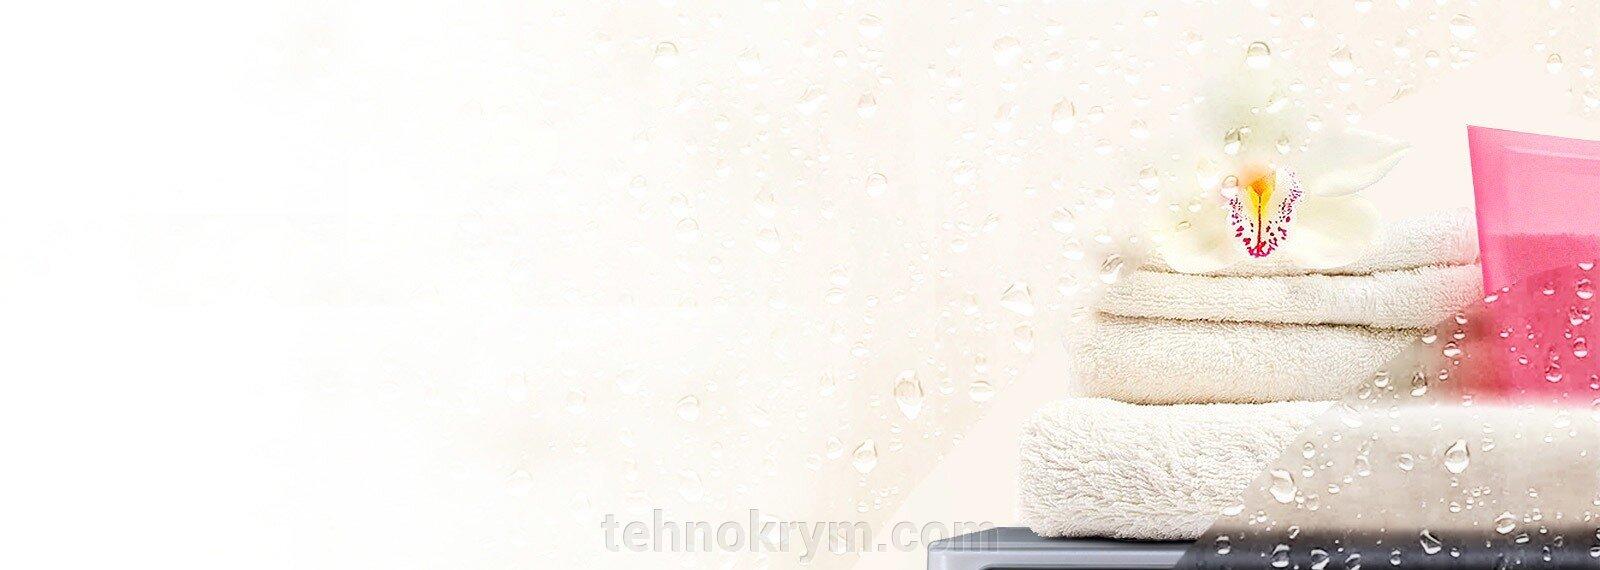 Стиральная машина LG F2H5HS6W с прямым приводом и функцией пара Steam - фото LG F2H5HS6W